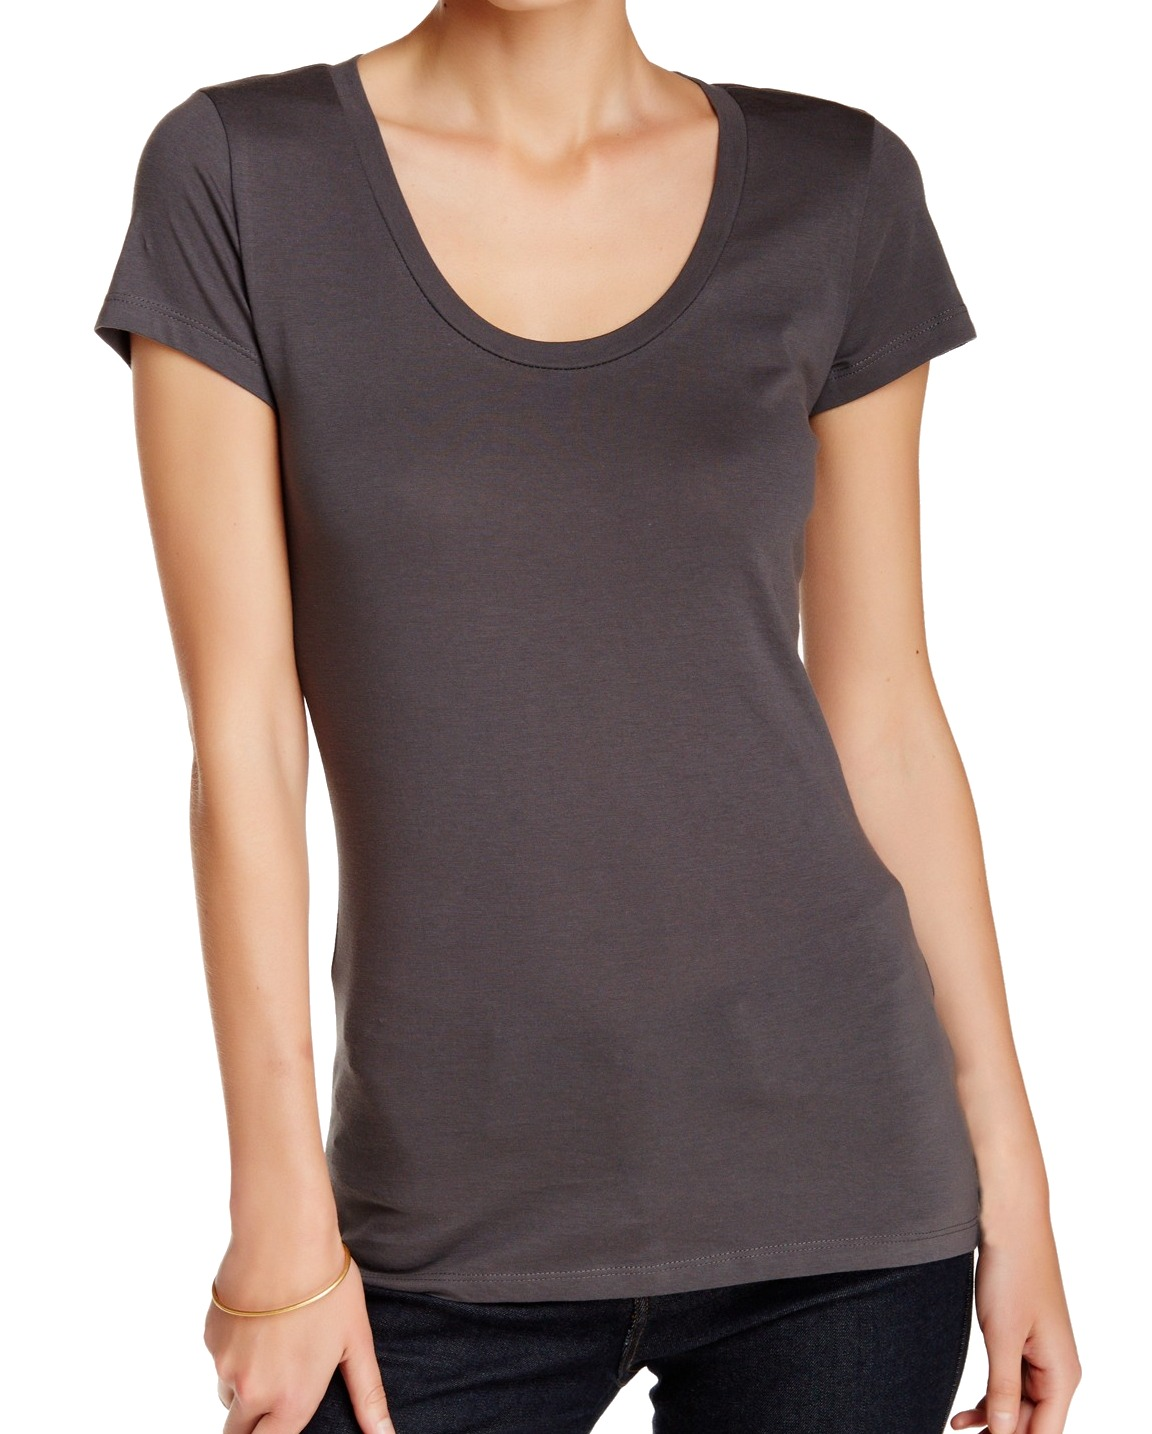 72d3796d0a39 susina - susina NEW Gray Charcoal Women's Medium M Solid Scoop-Neck ...